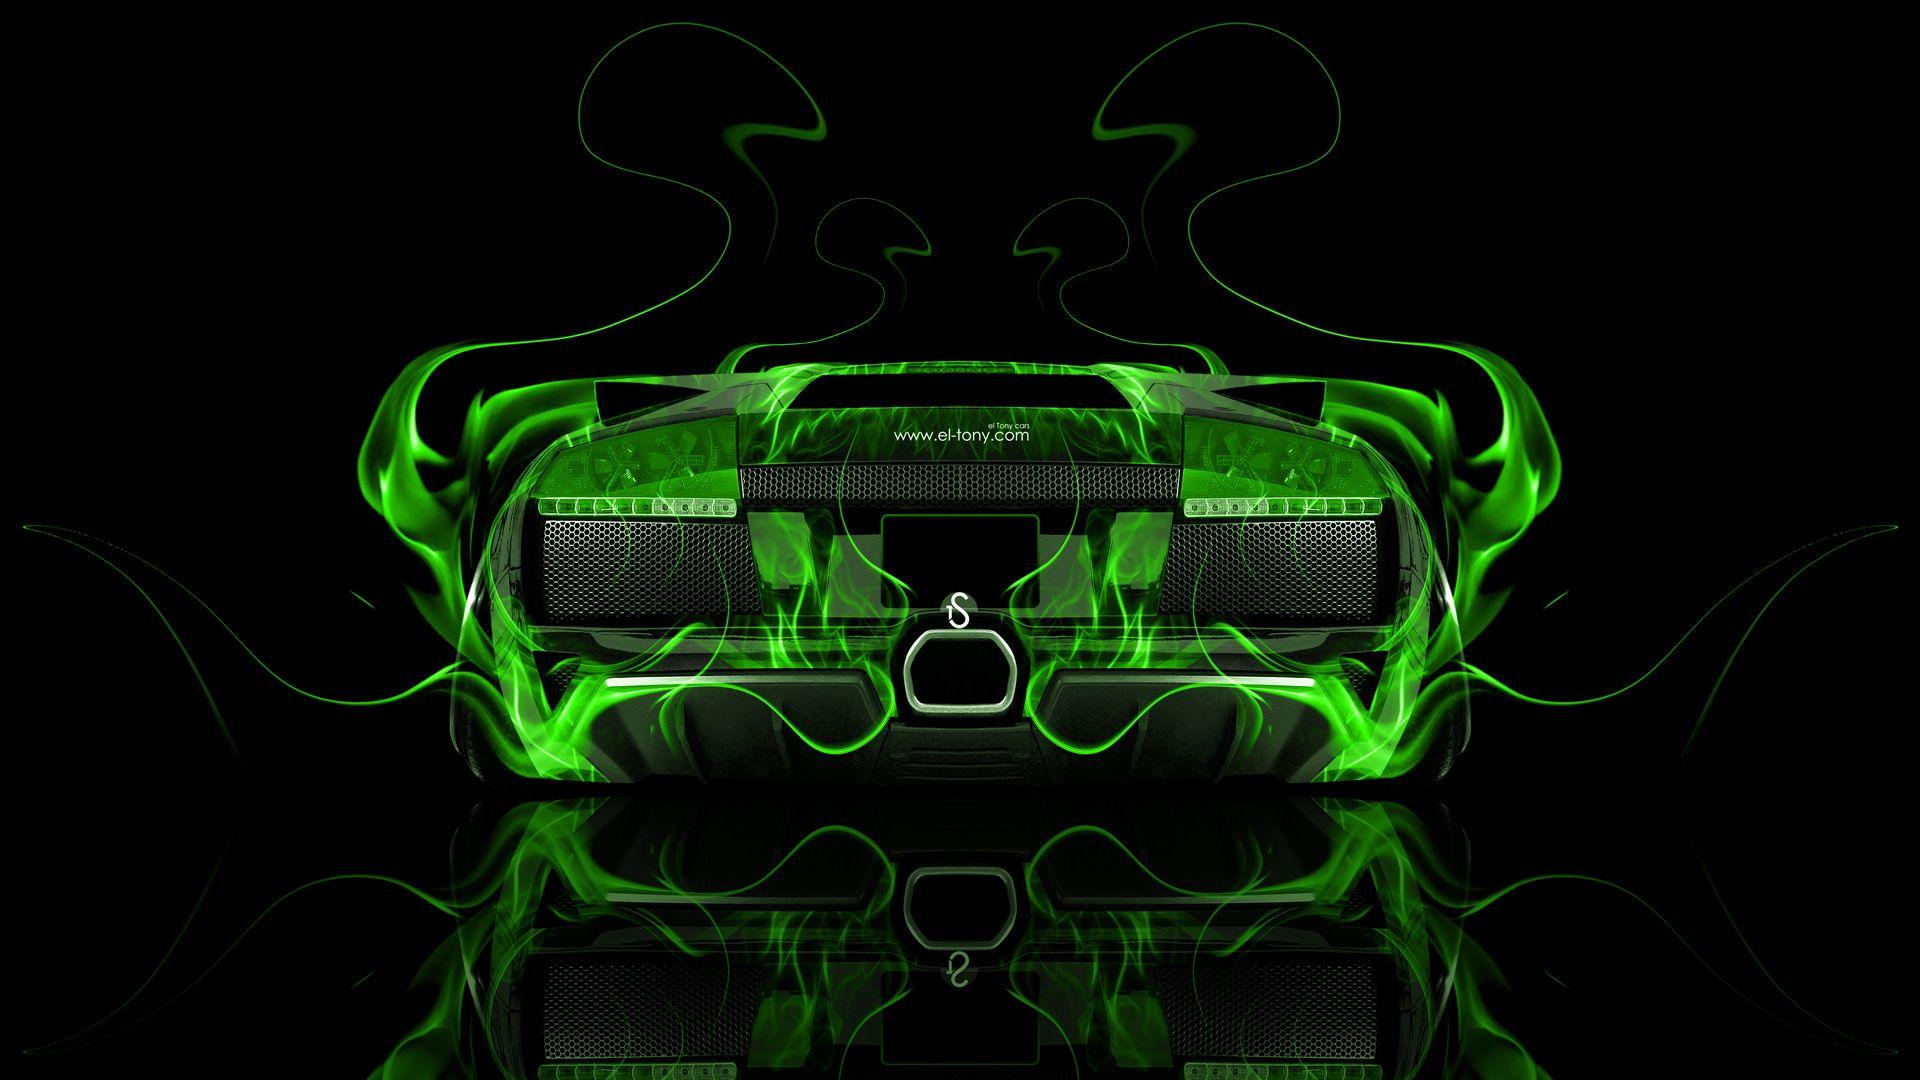 Merveilleux Lamborghini Murcielago Back Green Fire Abstract Car 2014